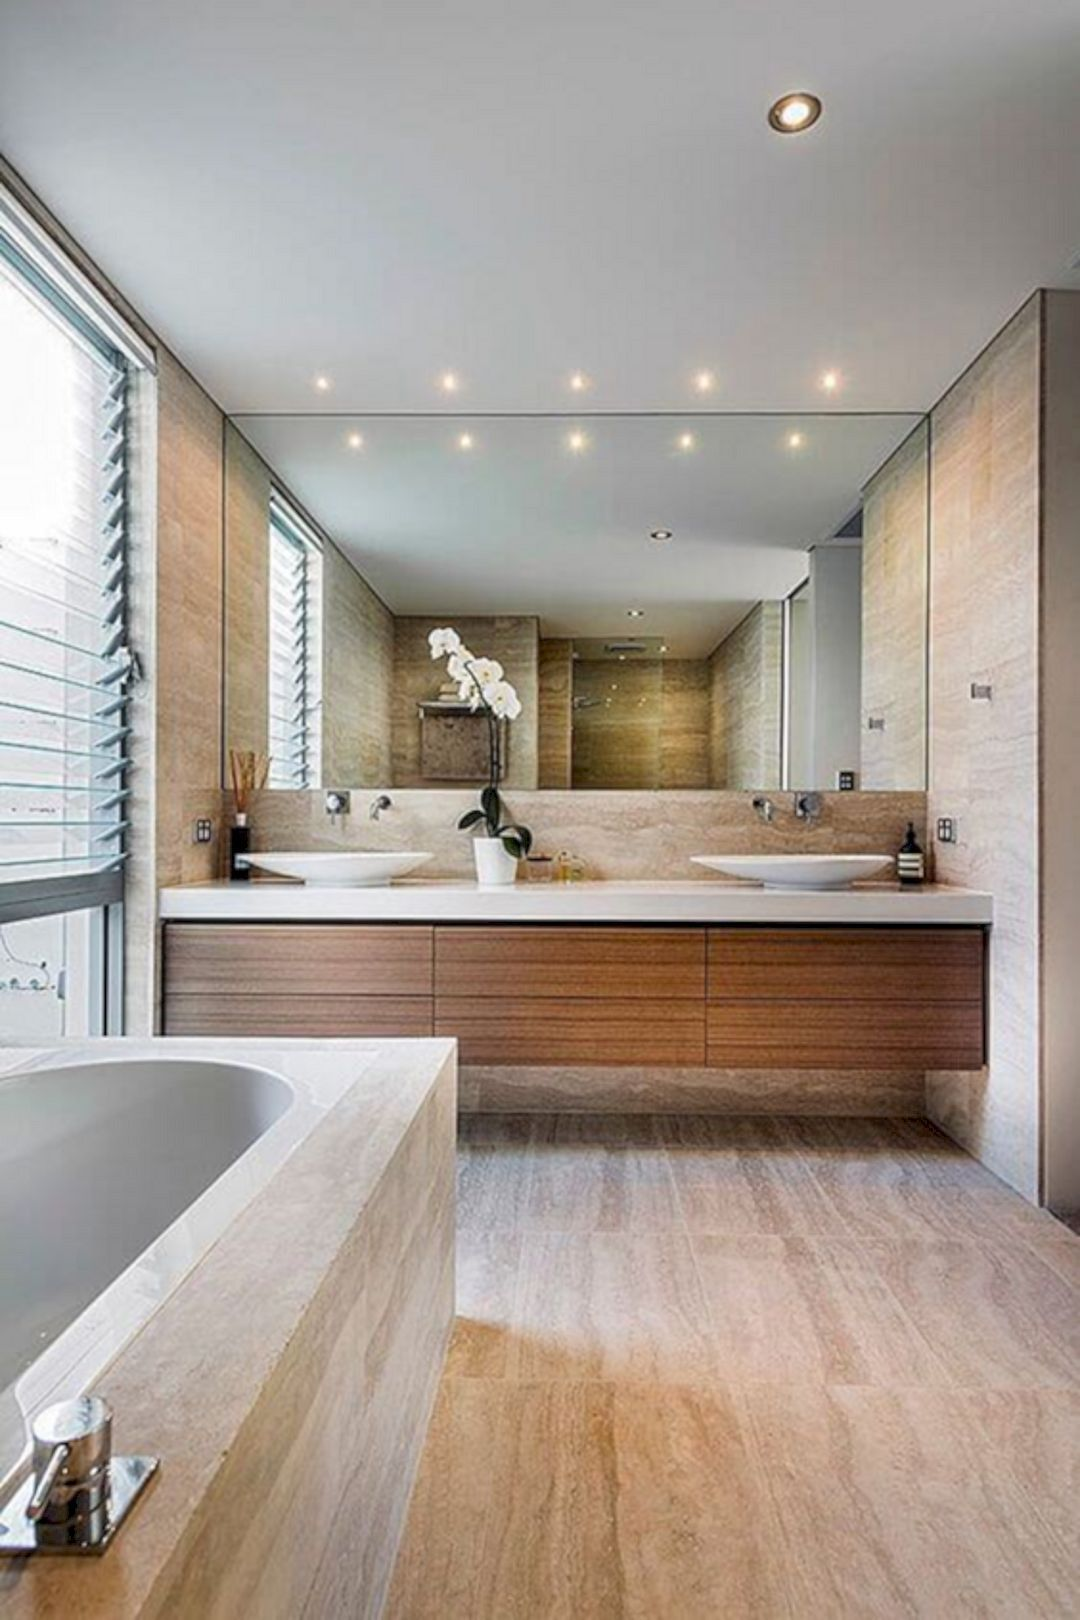 Mobili Da Bagno Como.Inspirations Ideas De Decoracion Del Bano Bagno Arredamento